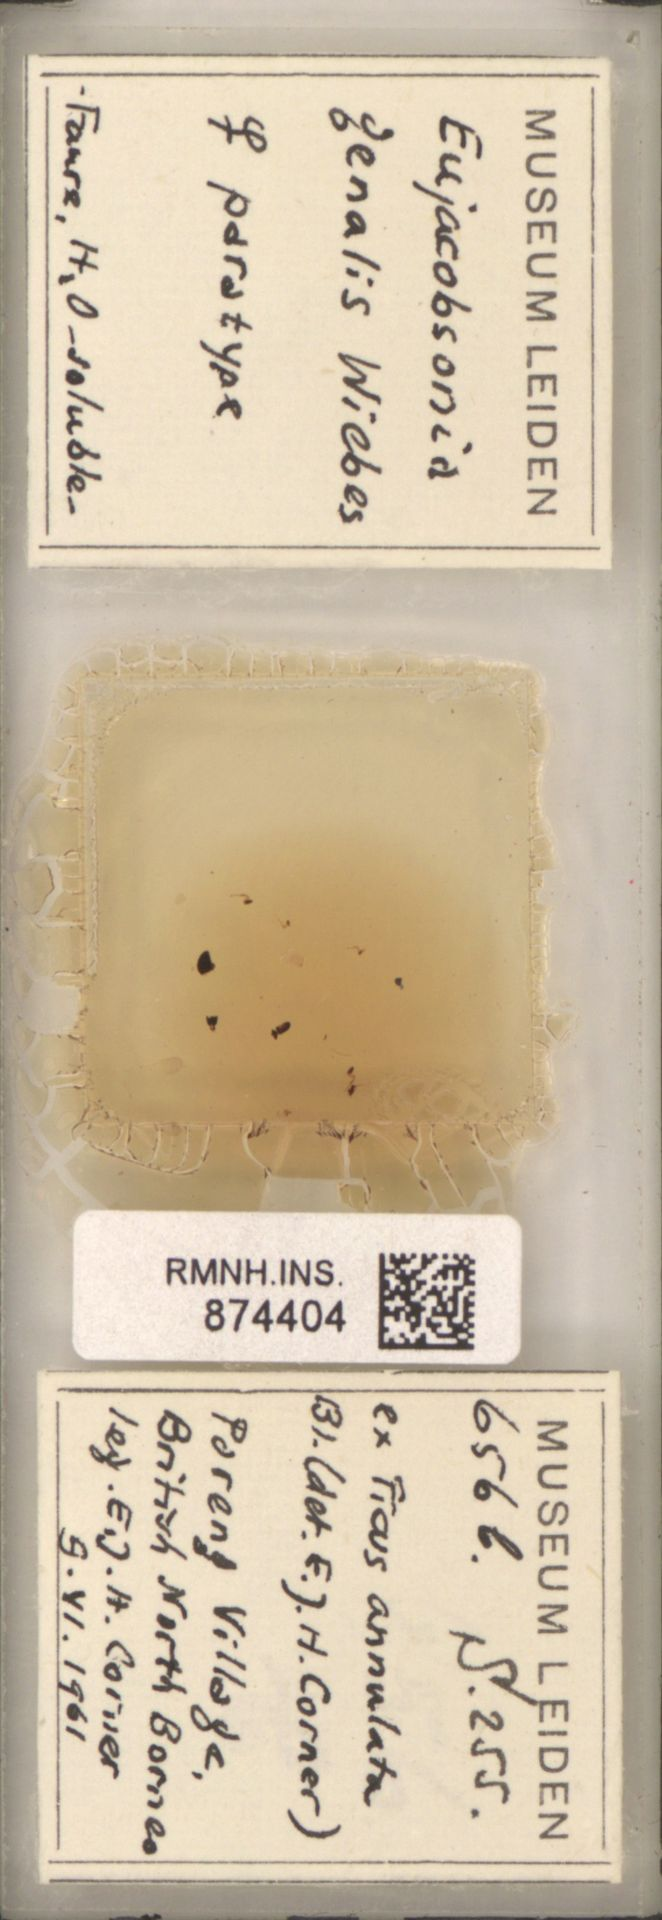 RMNH.INS.874404 | Eujacobsonia genalis Wiebes